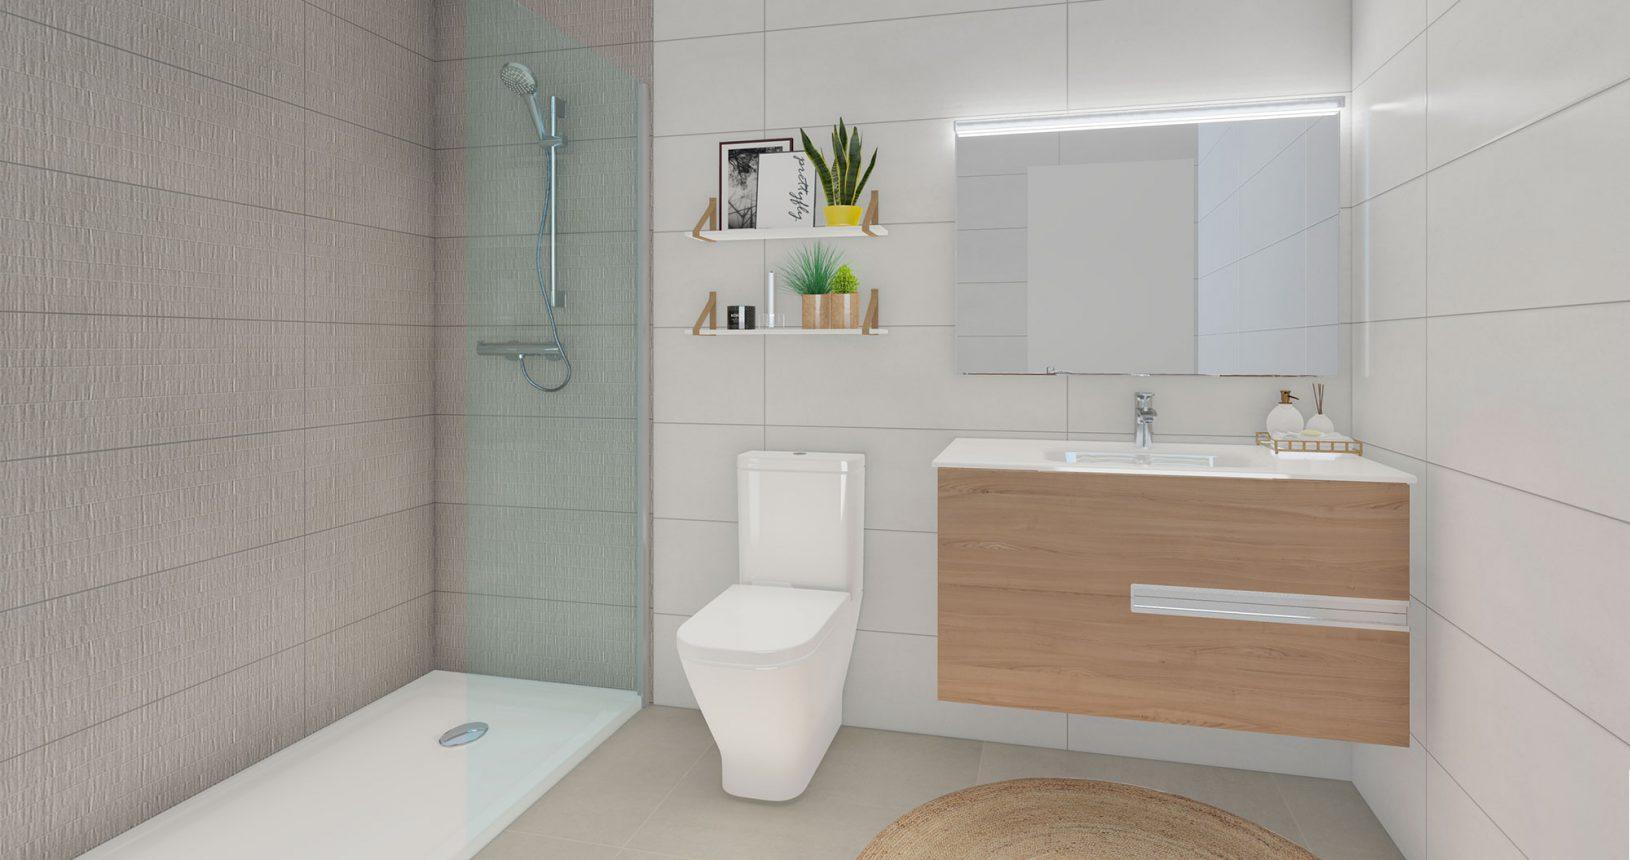 Promoción Paramera Inmobiliaria Ciencasas Paiporta baño principal